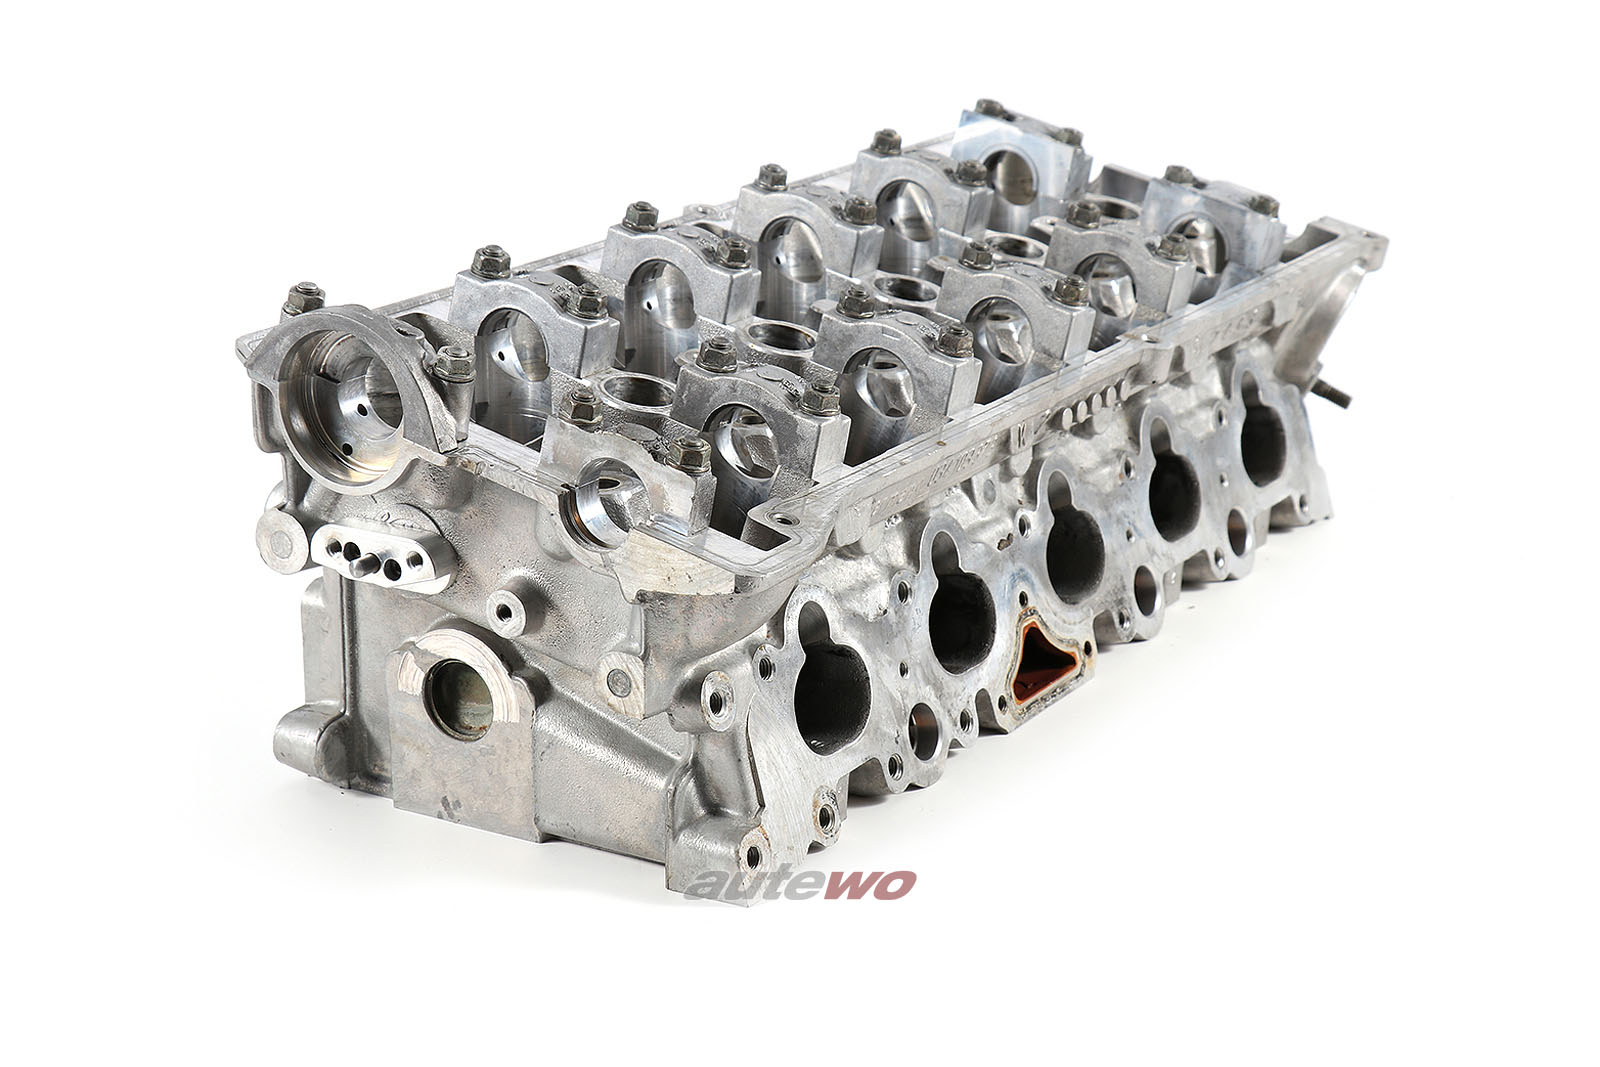 034103351N Audi S2/RS2/Urquattro/S4/S6 C4 20V Turbo Zylinderkopf rissfrei